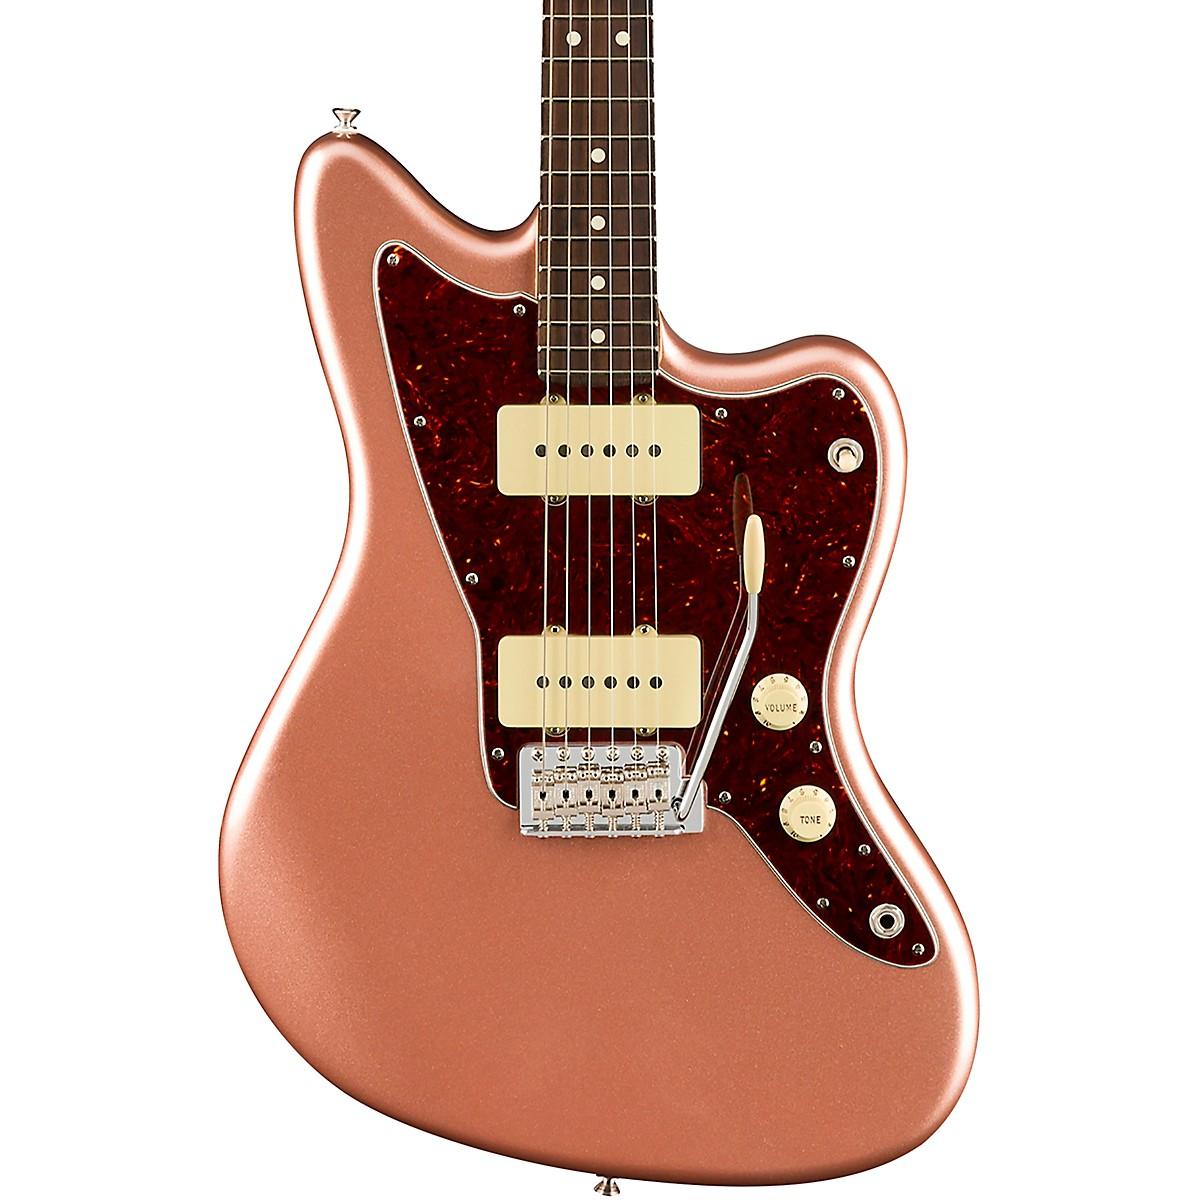 Fender American Performer Jazzmaster Rosewood Fingerboard Electric Guitar